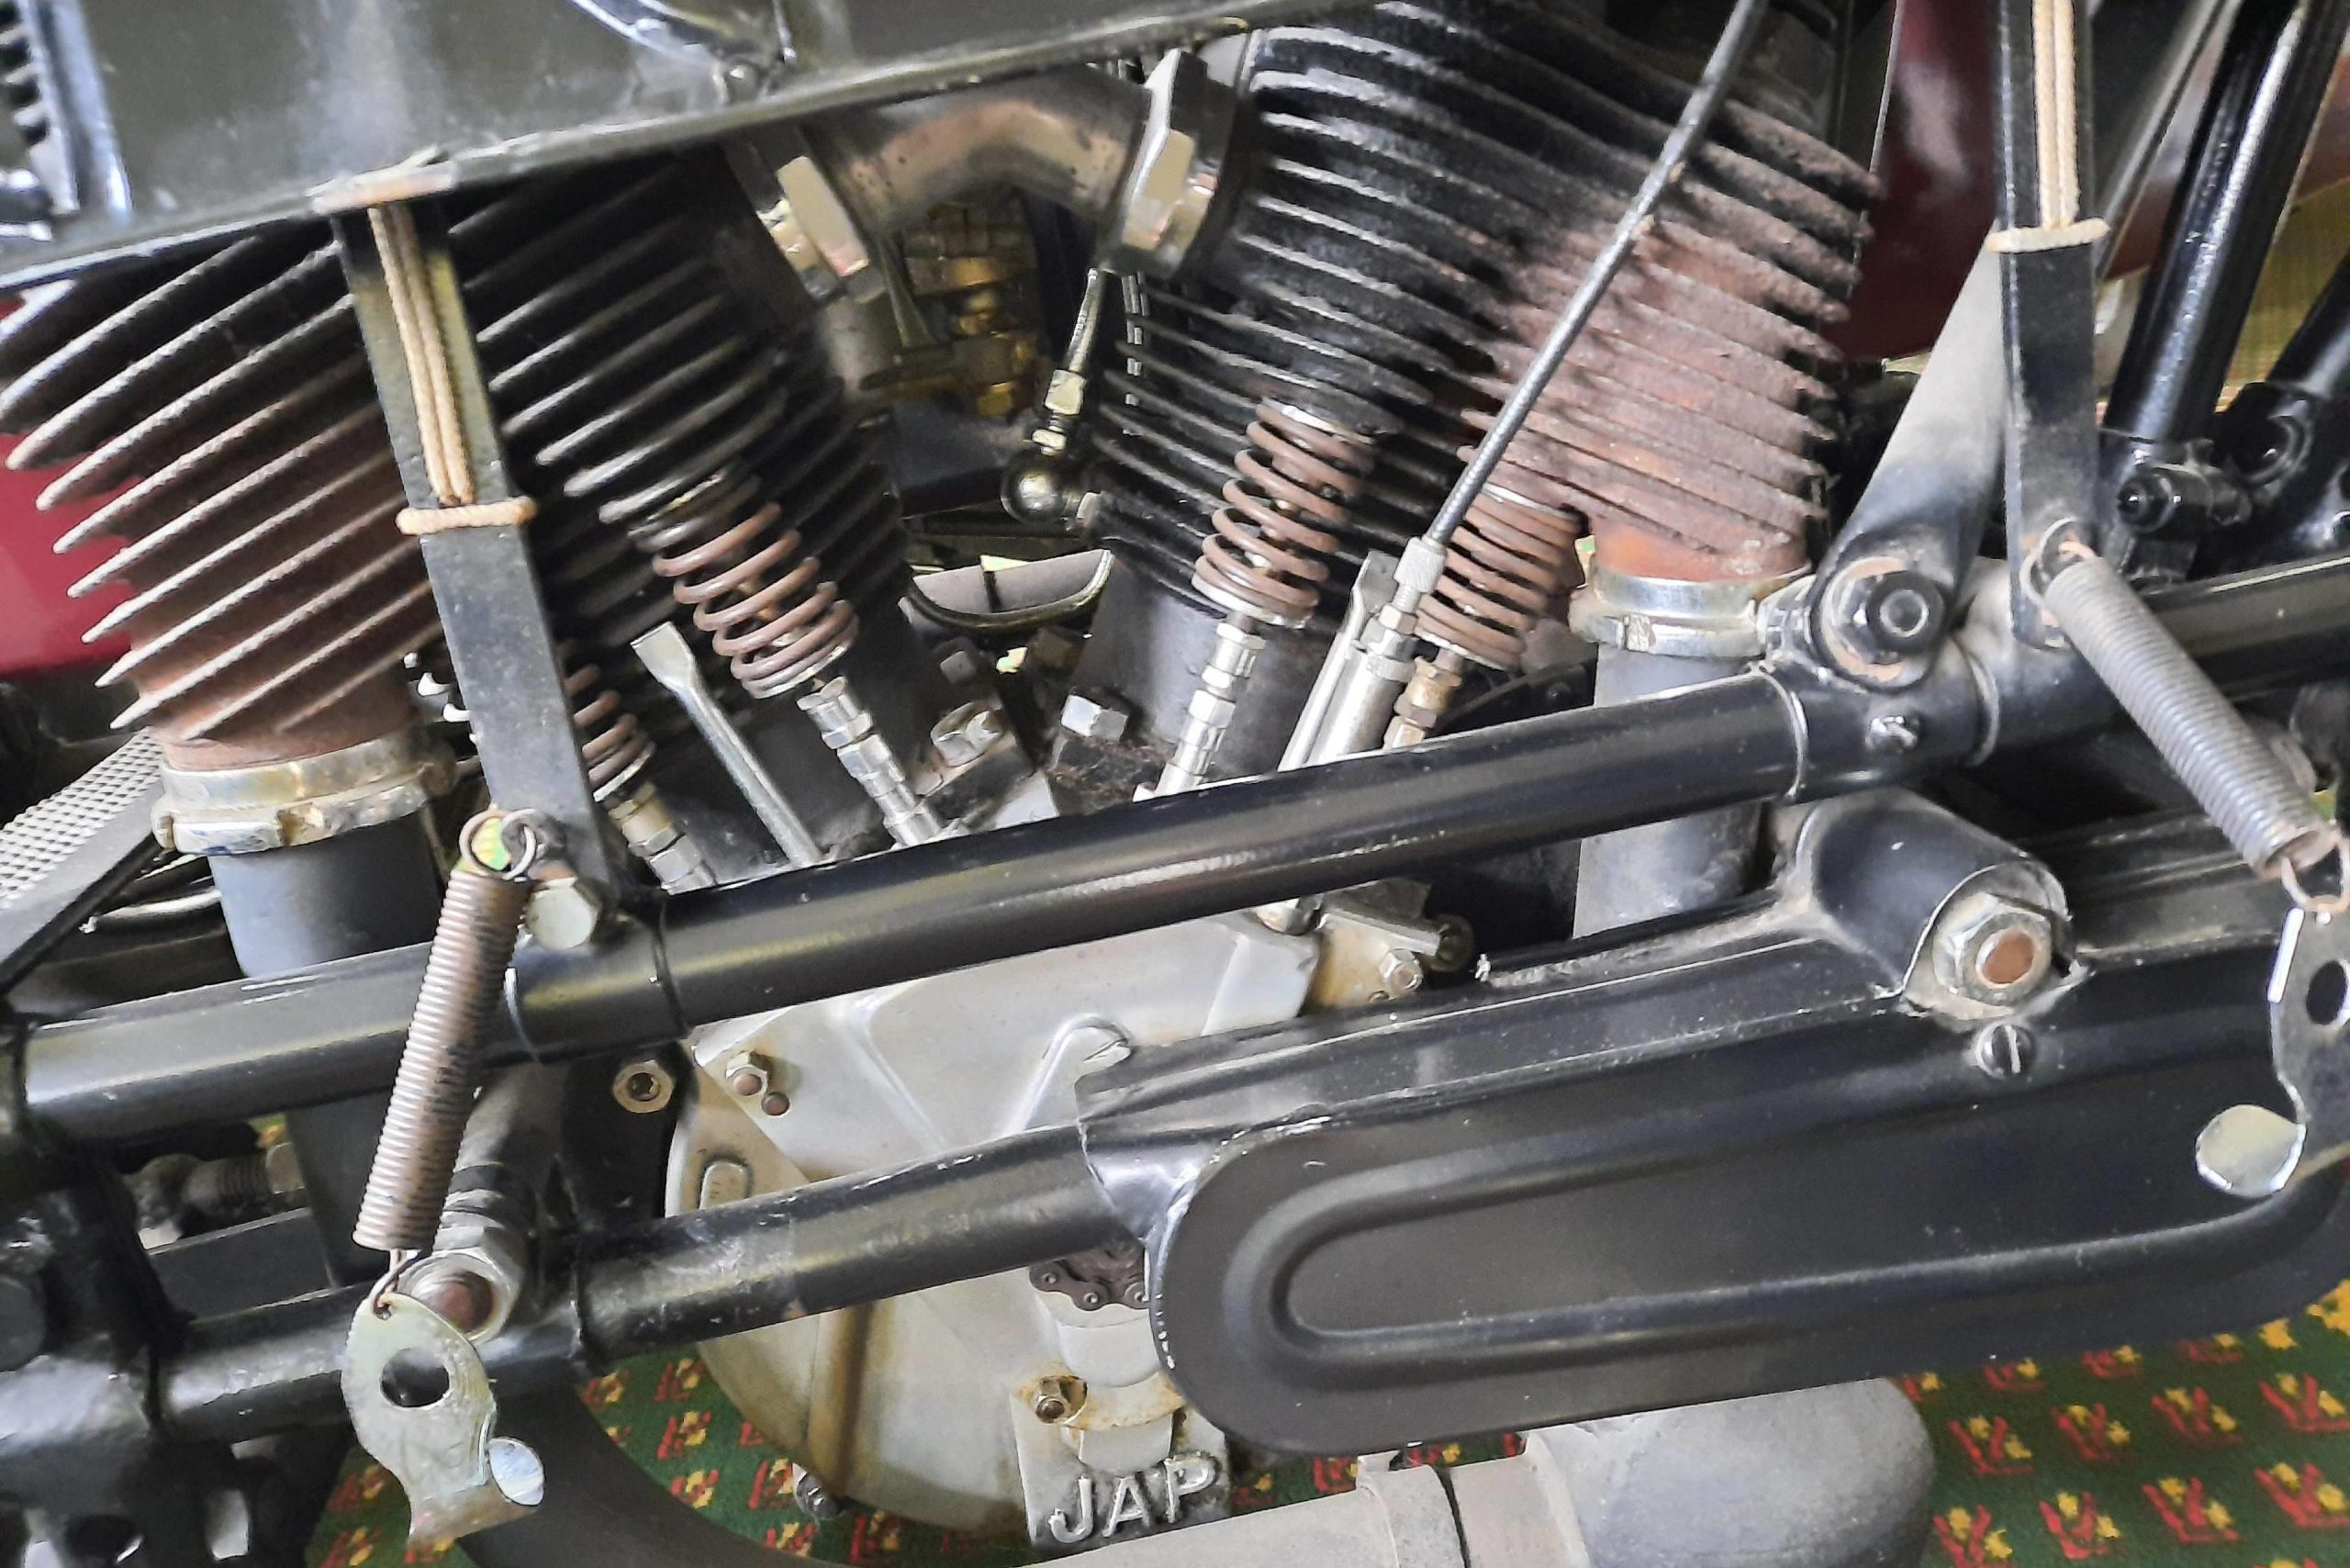 1925 Seal 980CC Motorcycle engine close